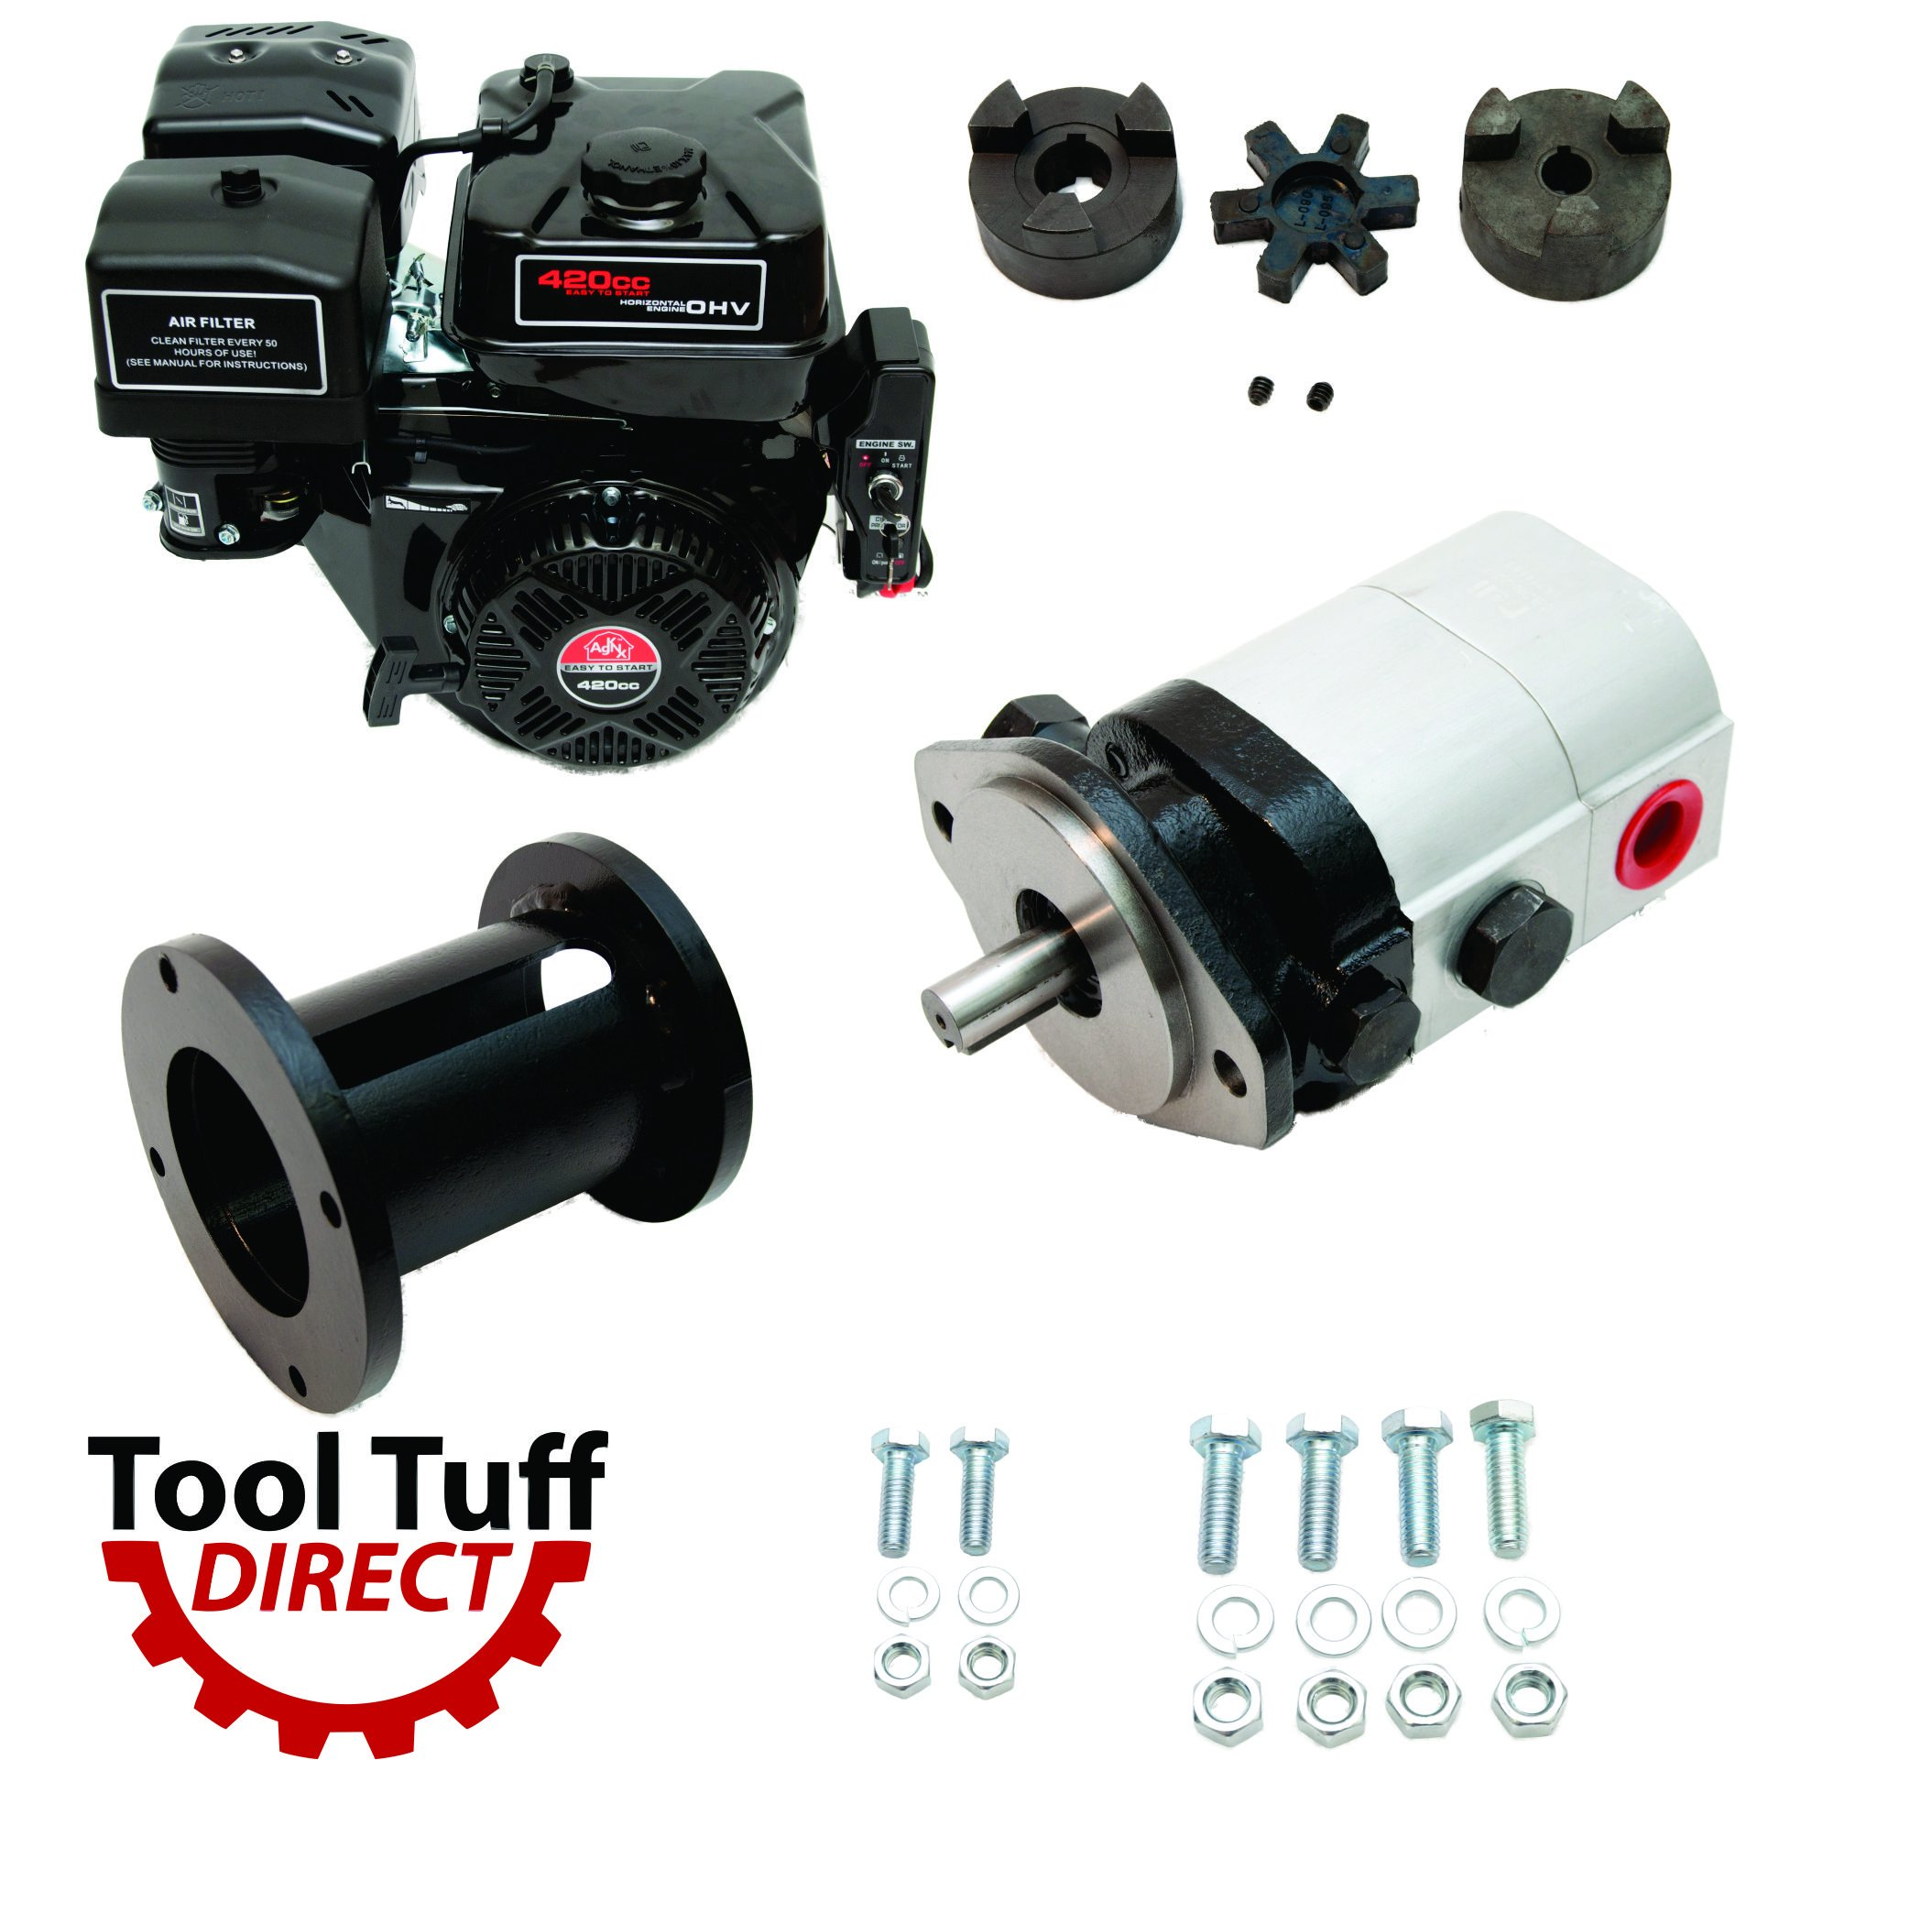 Tool Tuff Log Splitter Build Kit - 15 hp Electric-Start Engine, 28 GPM Pump, Coupler, Mount & Hardware